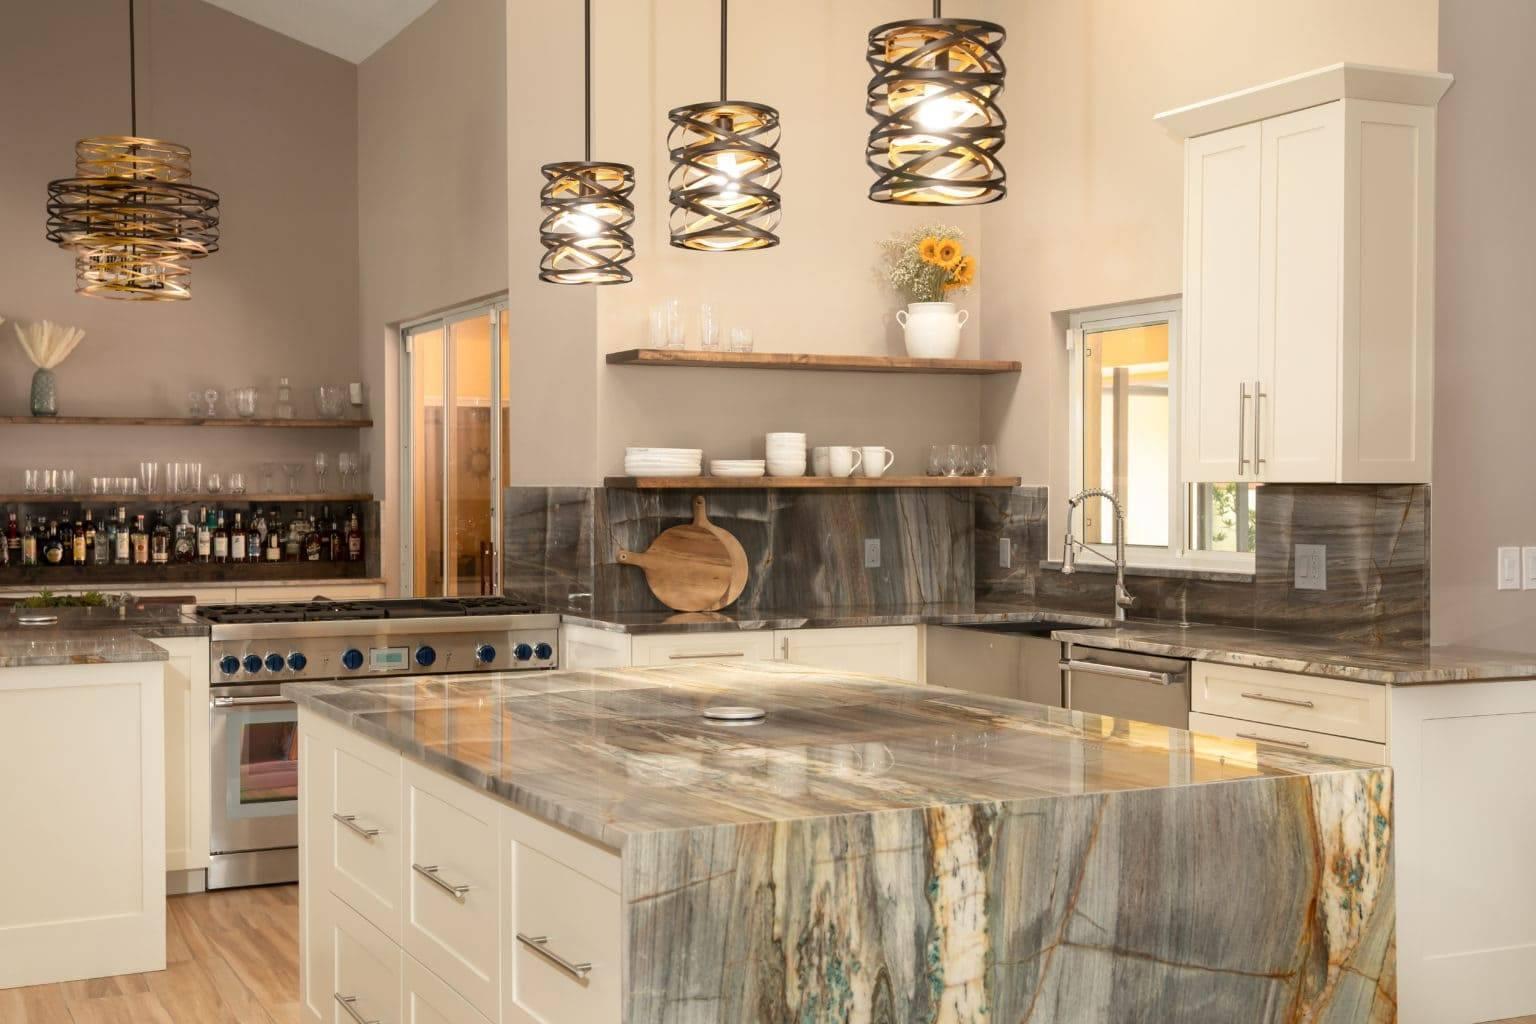 Turquoise Quartzite Kitchen 8 1536x1024, Primestones® Granite, Quartz, Marble